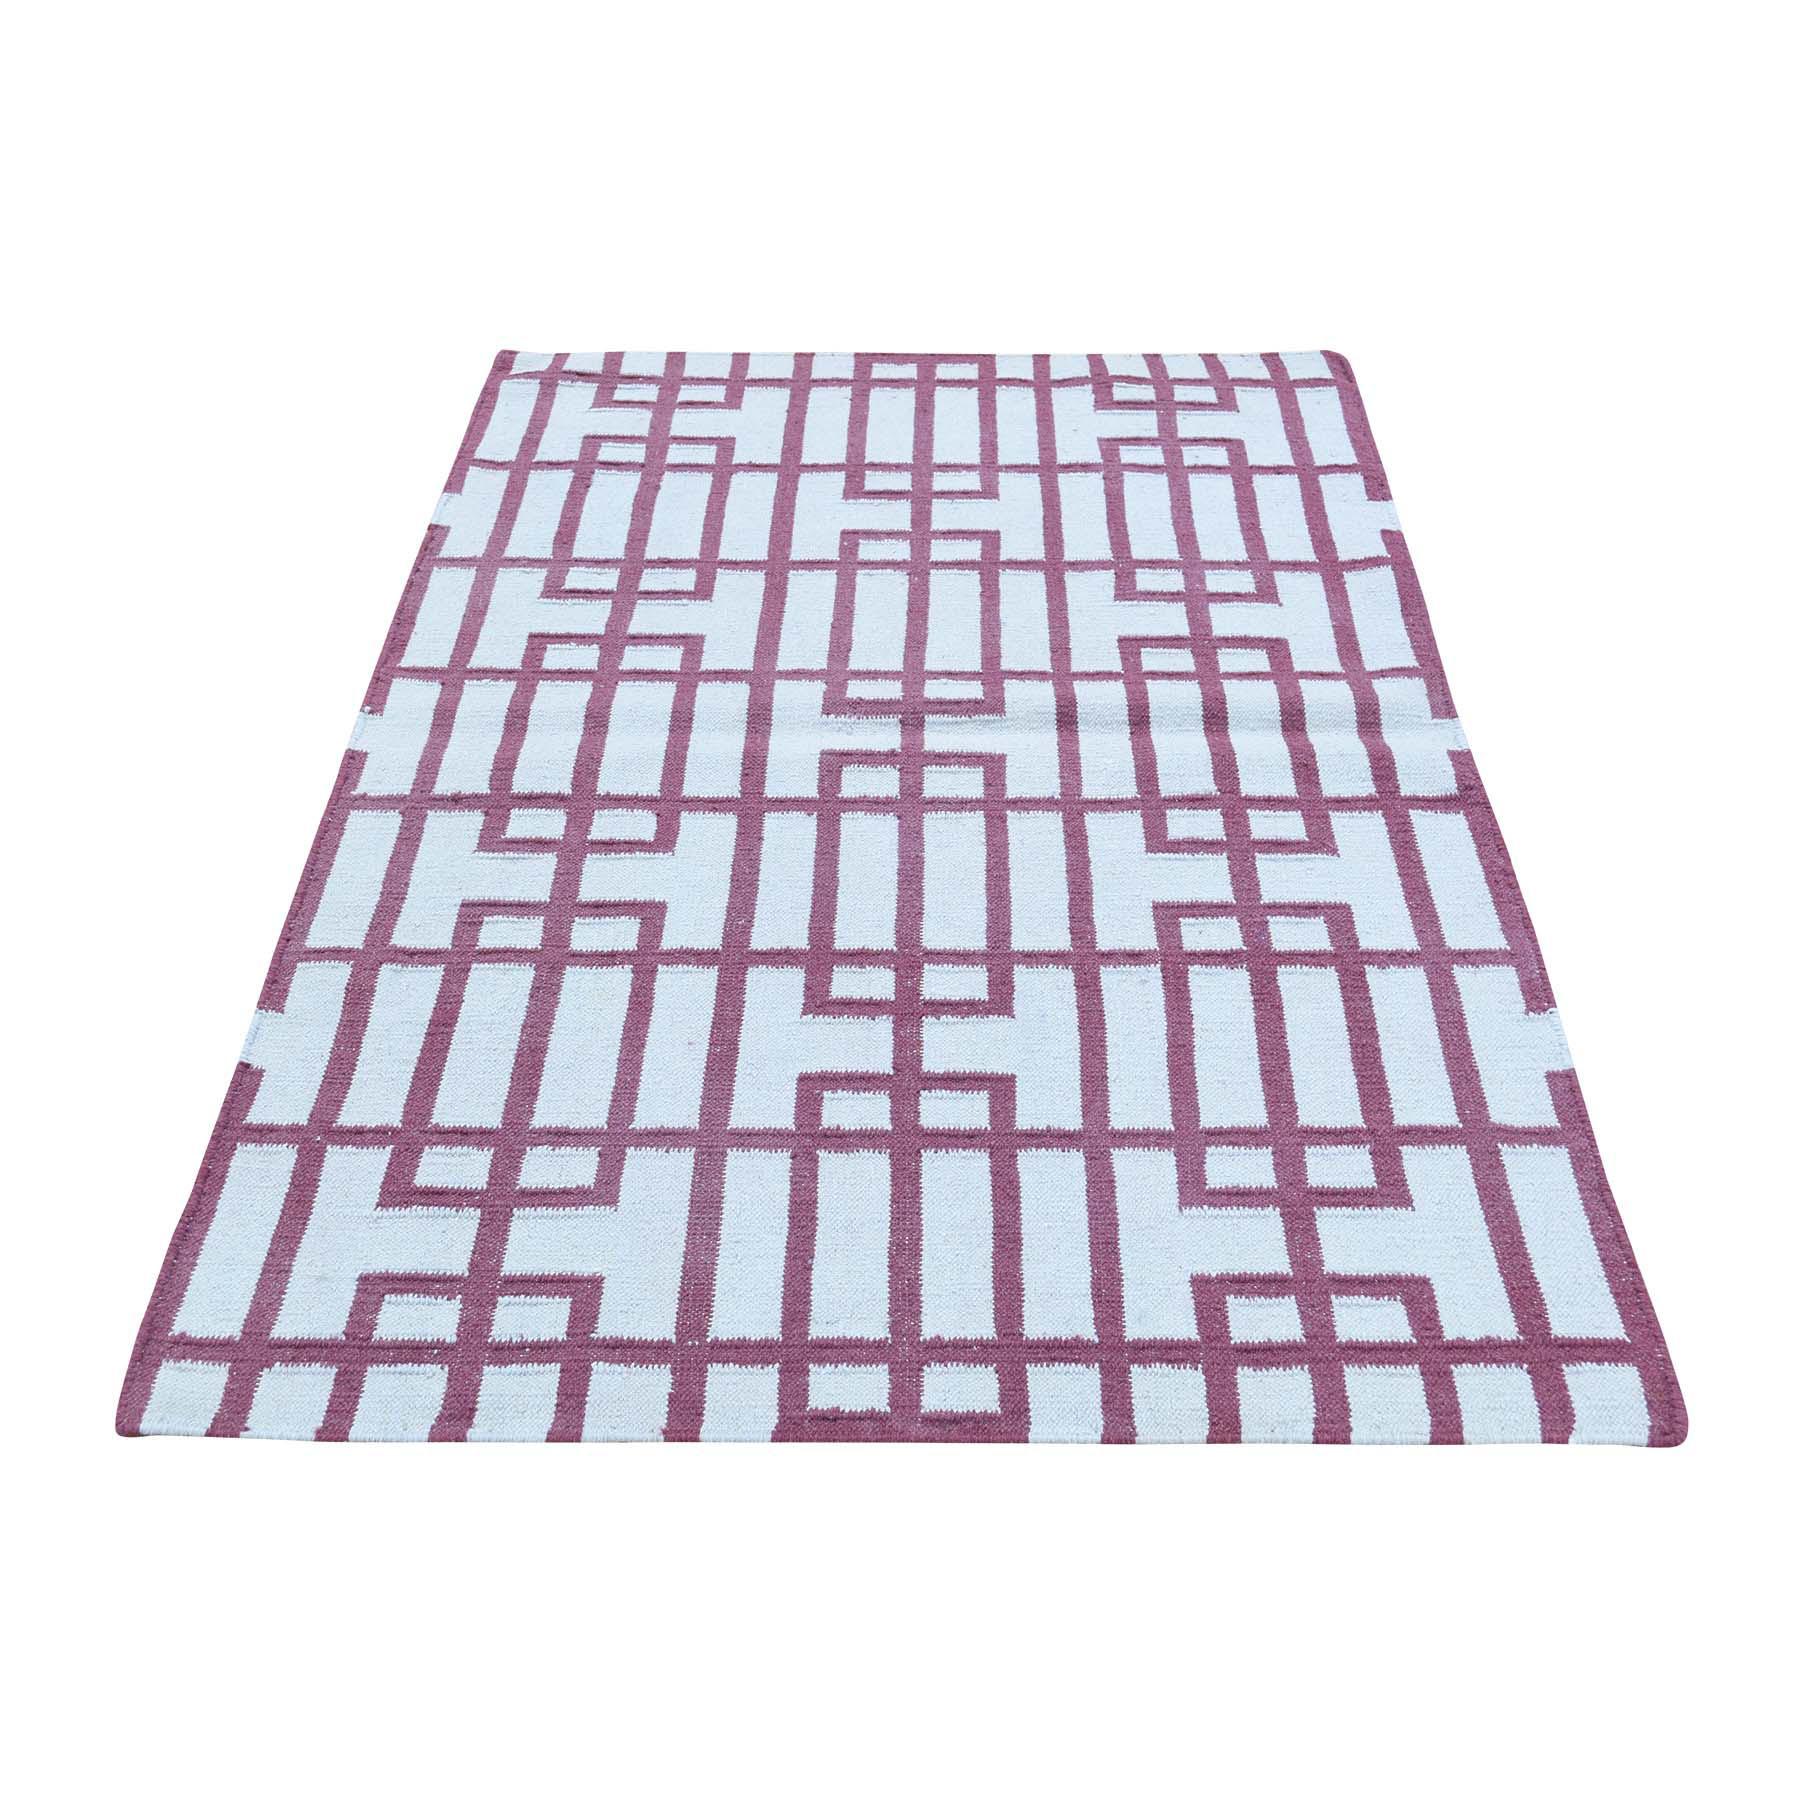 "3'X5'4"" Geometric Design Flat Weave Hand-Woven Reversible Kilim Carpet moacb0a8"